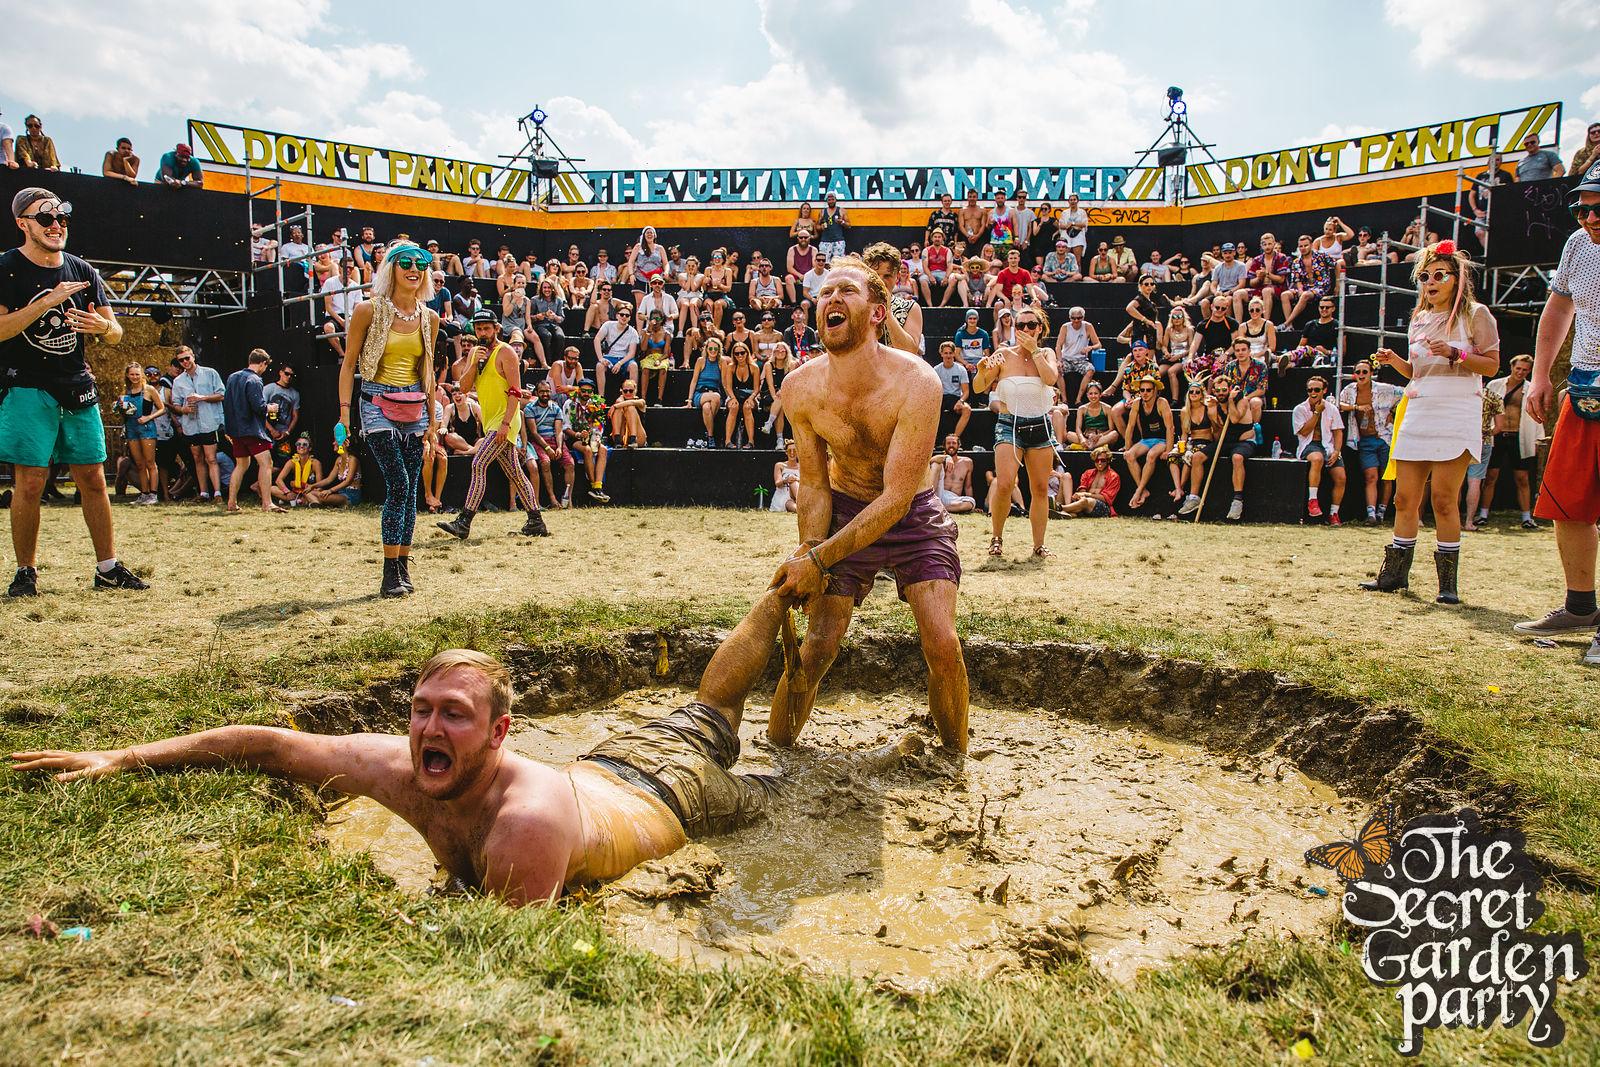 Secret Garden Party | 2016 | Mud Wrestling | People